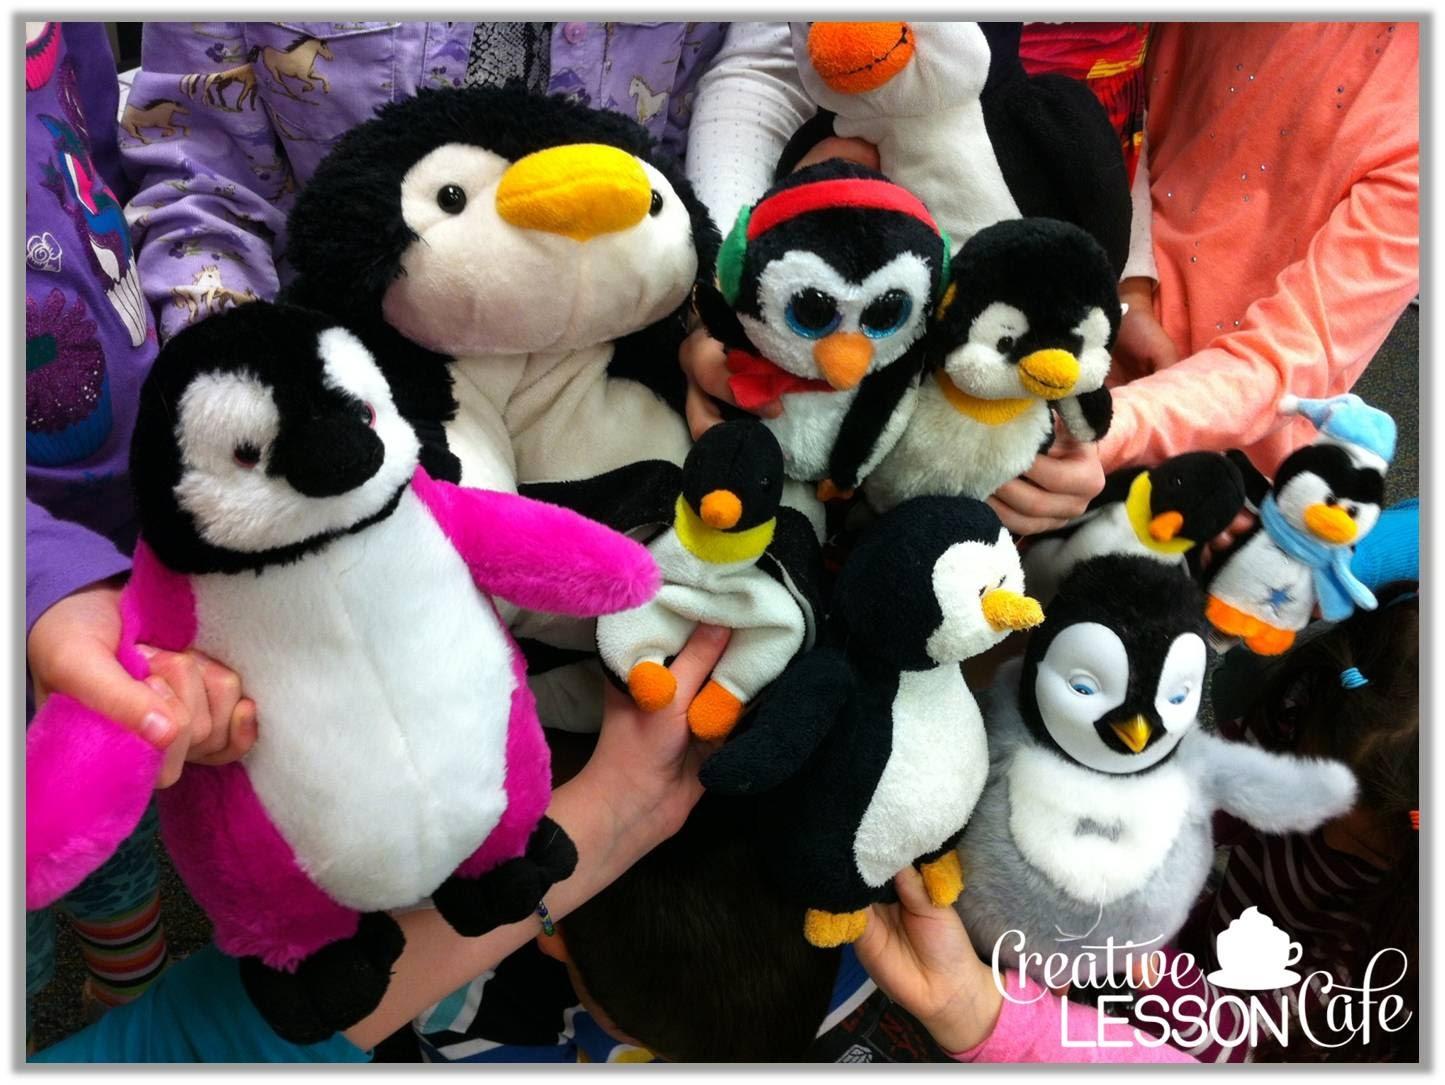 Creative Lesson Cafe Wacky Tacky The Penguin Fun